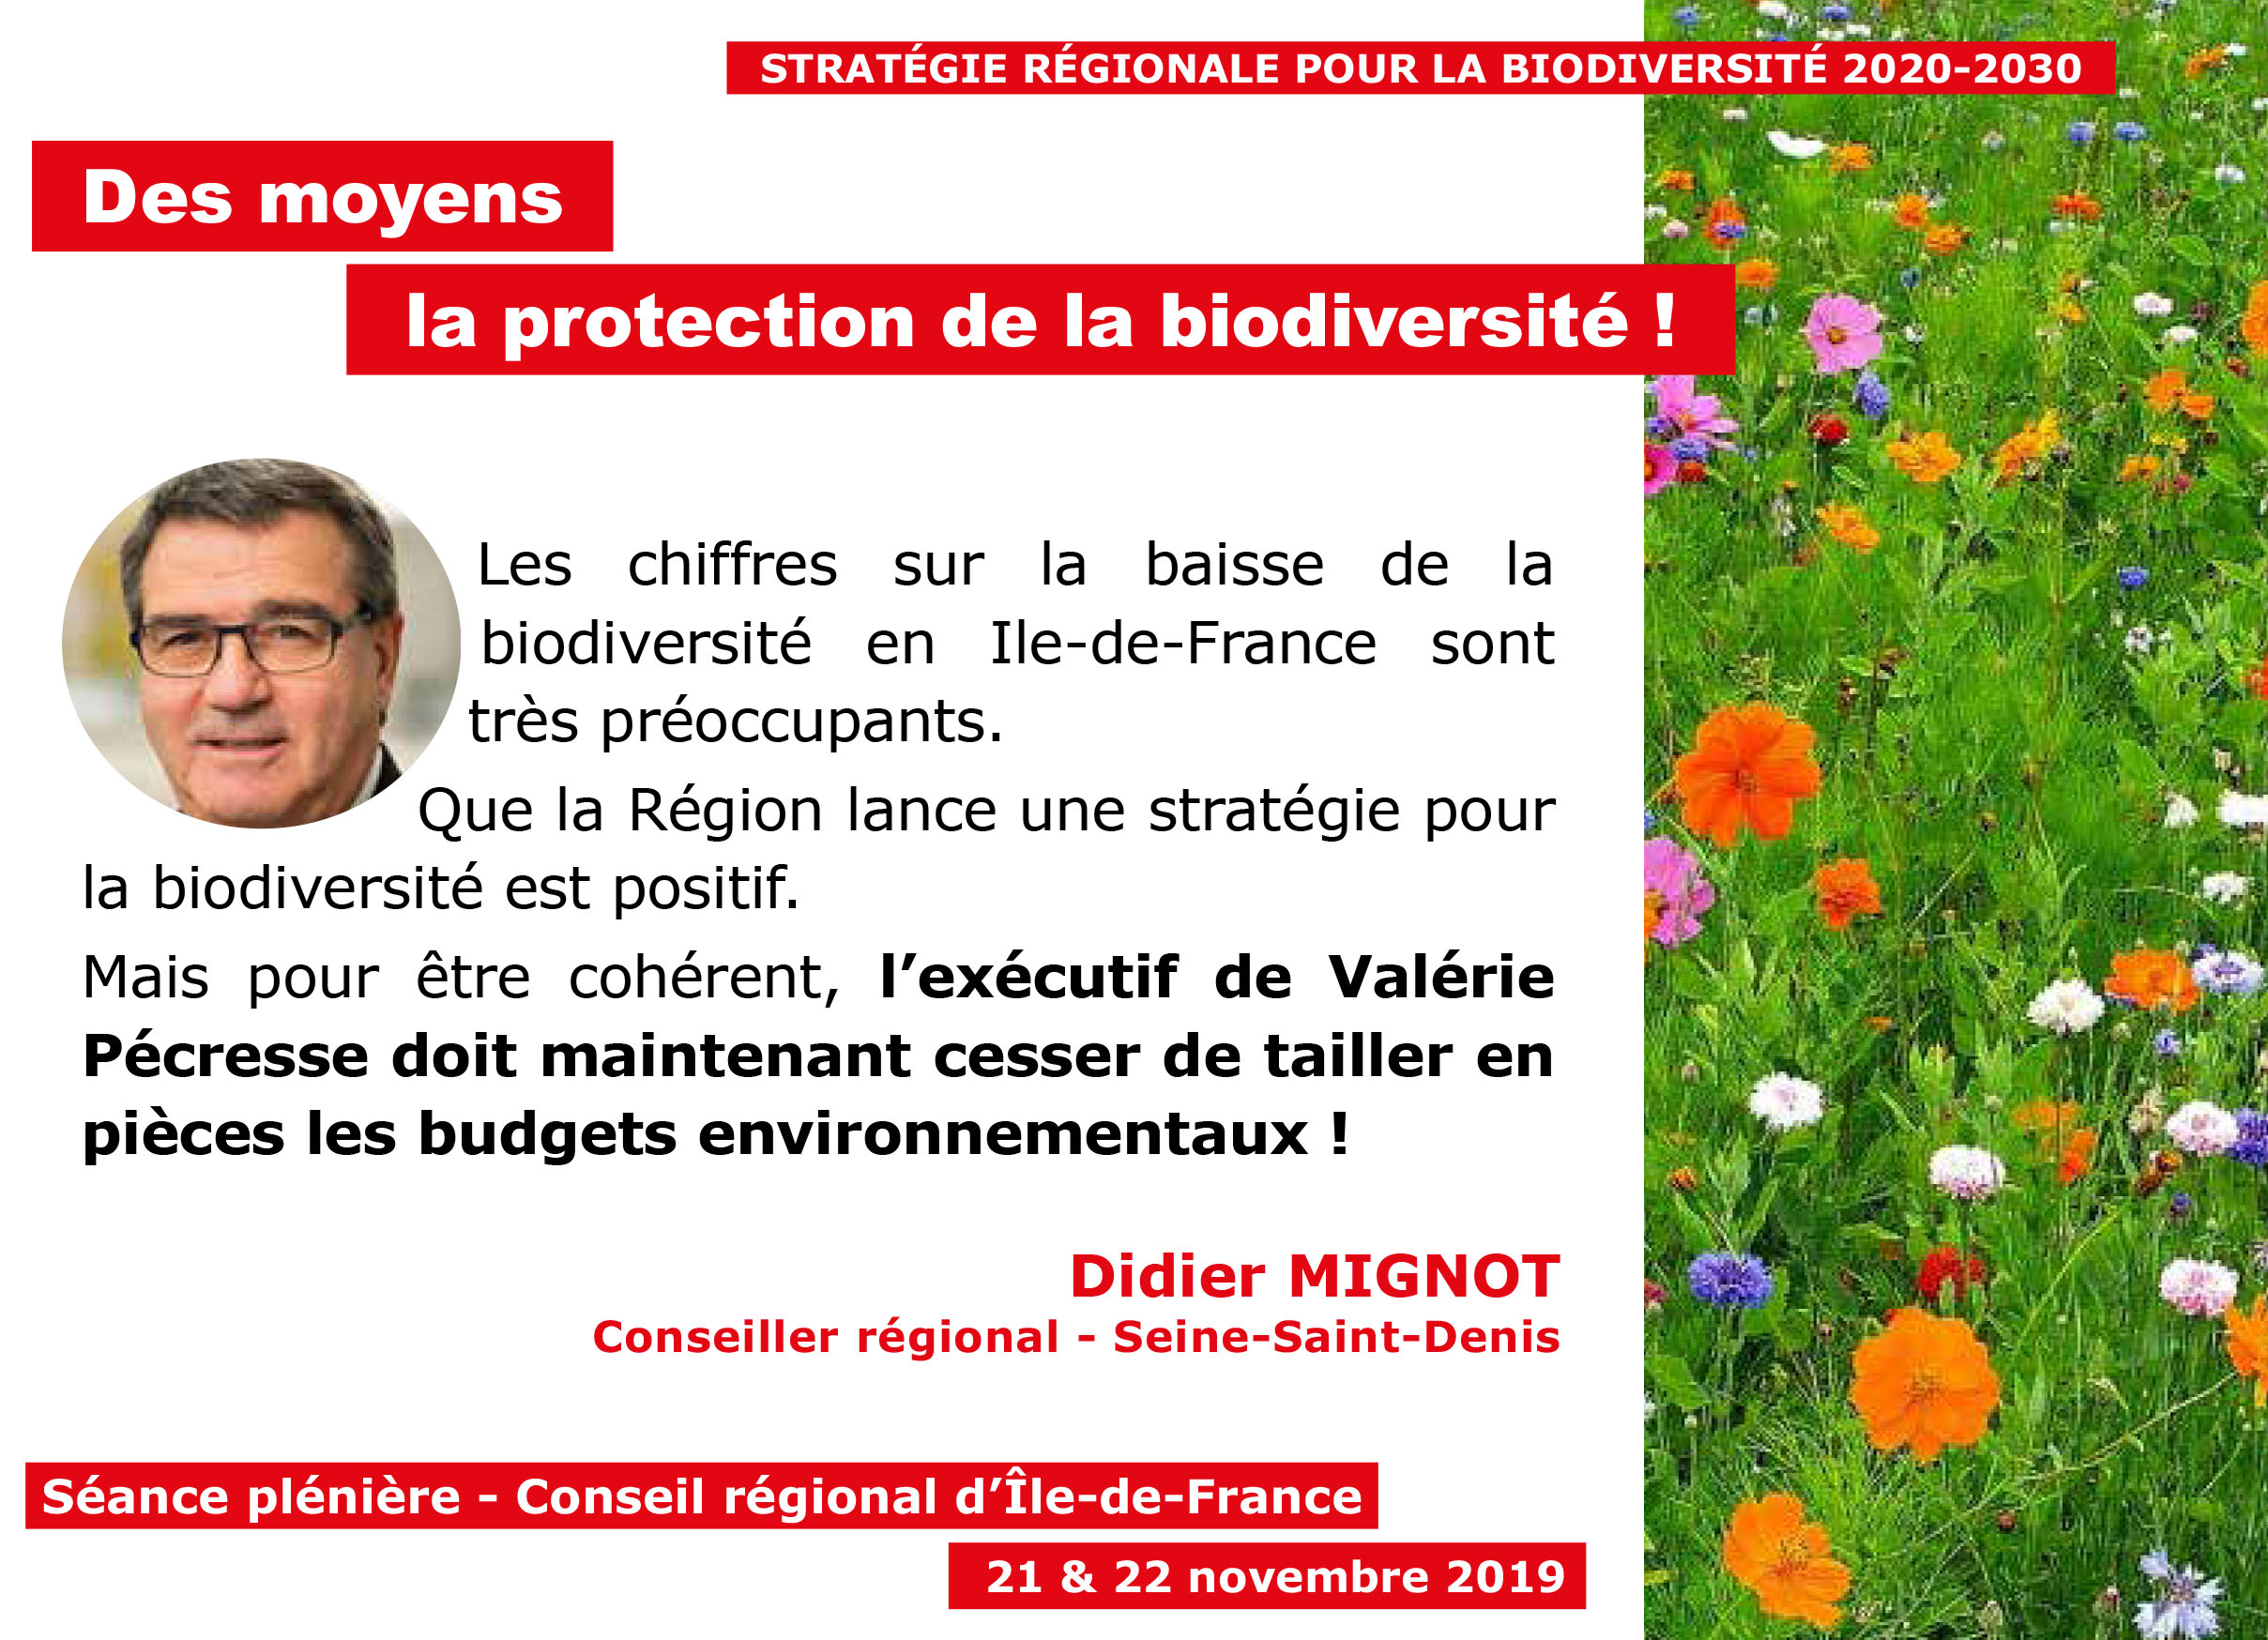 Vignette_Didier_biodiversite_moyens